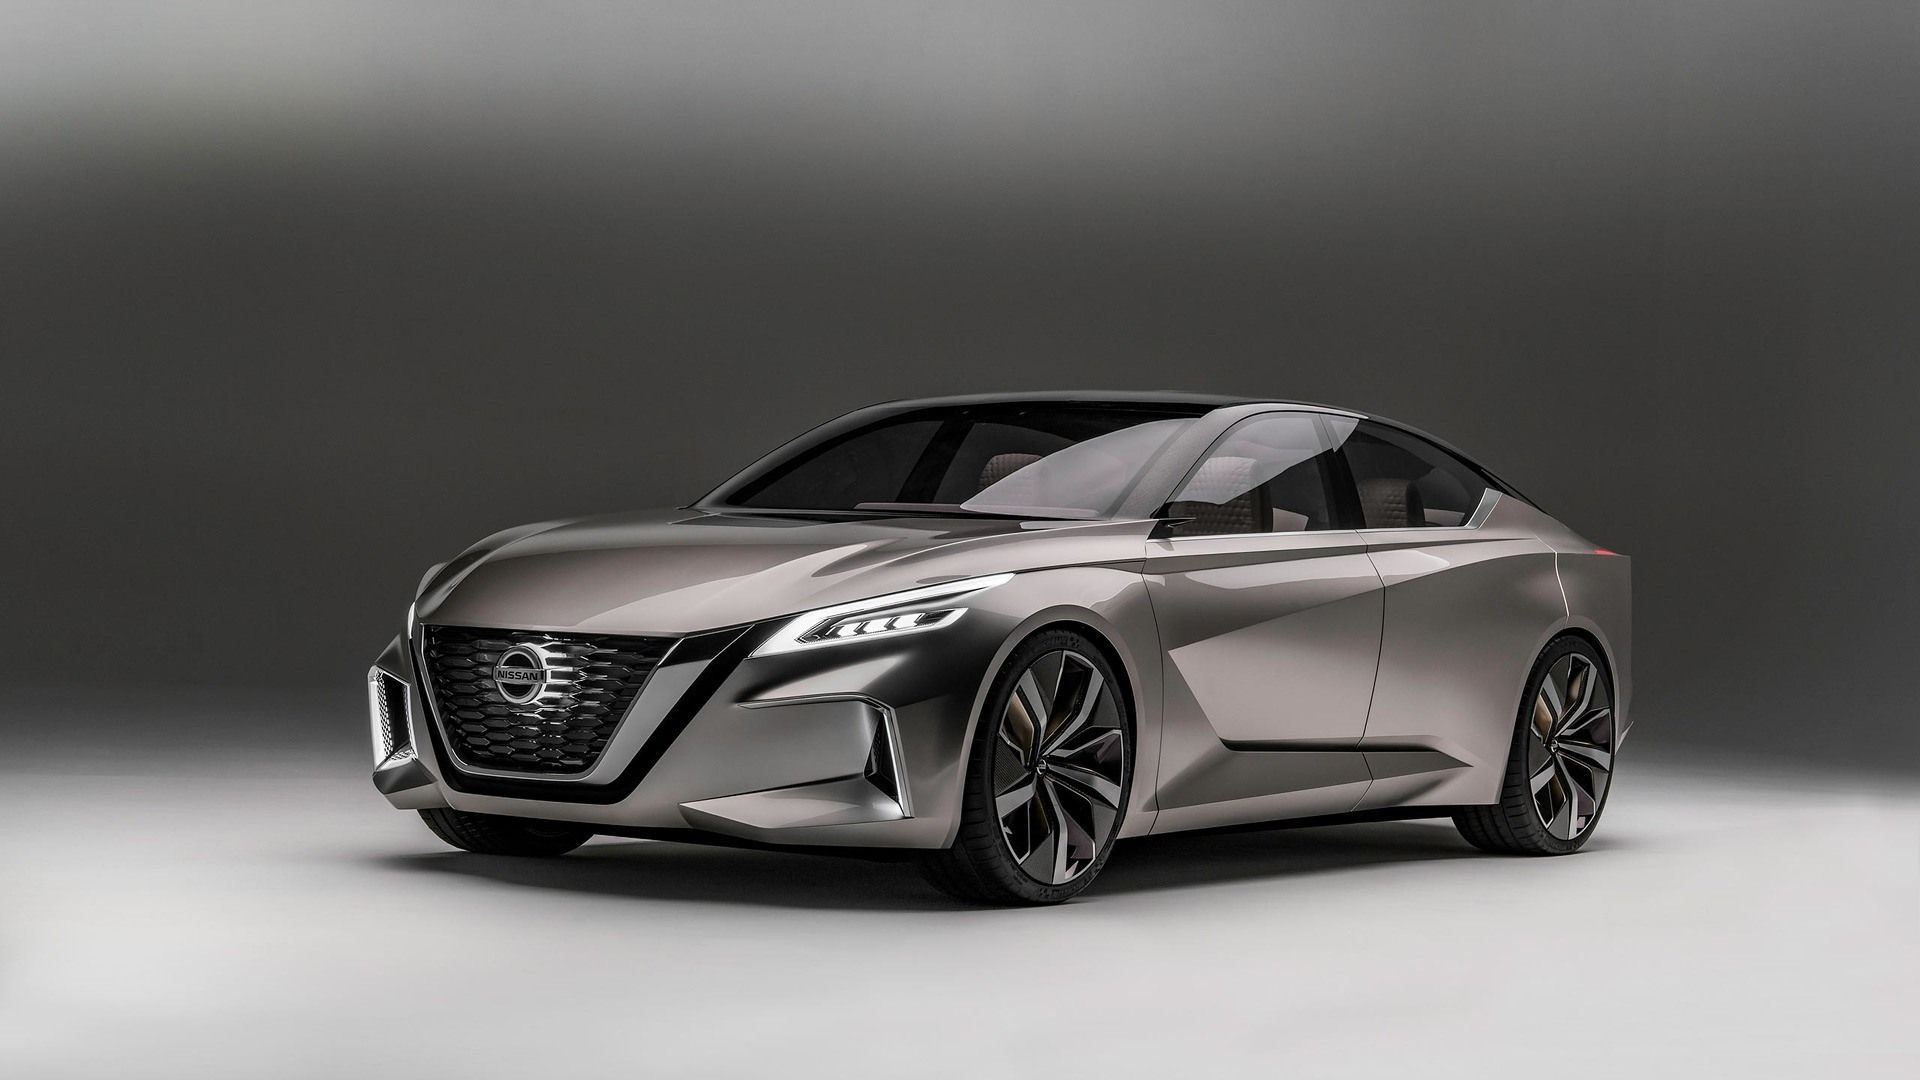 Best 2020 Nissan Maxima Detailed Spy Shoot Nissan Maxima Nissan